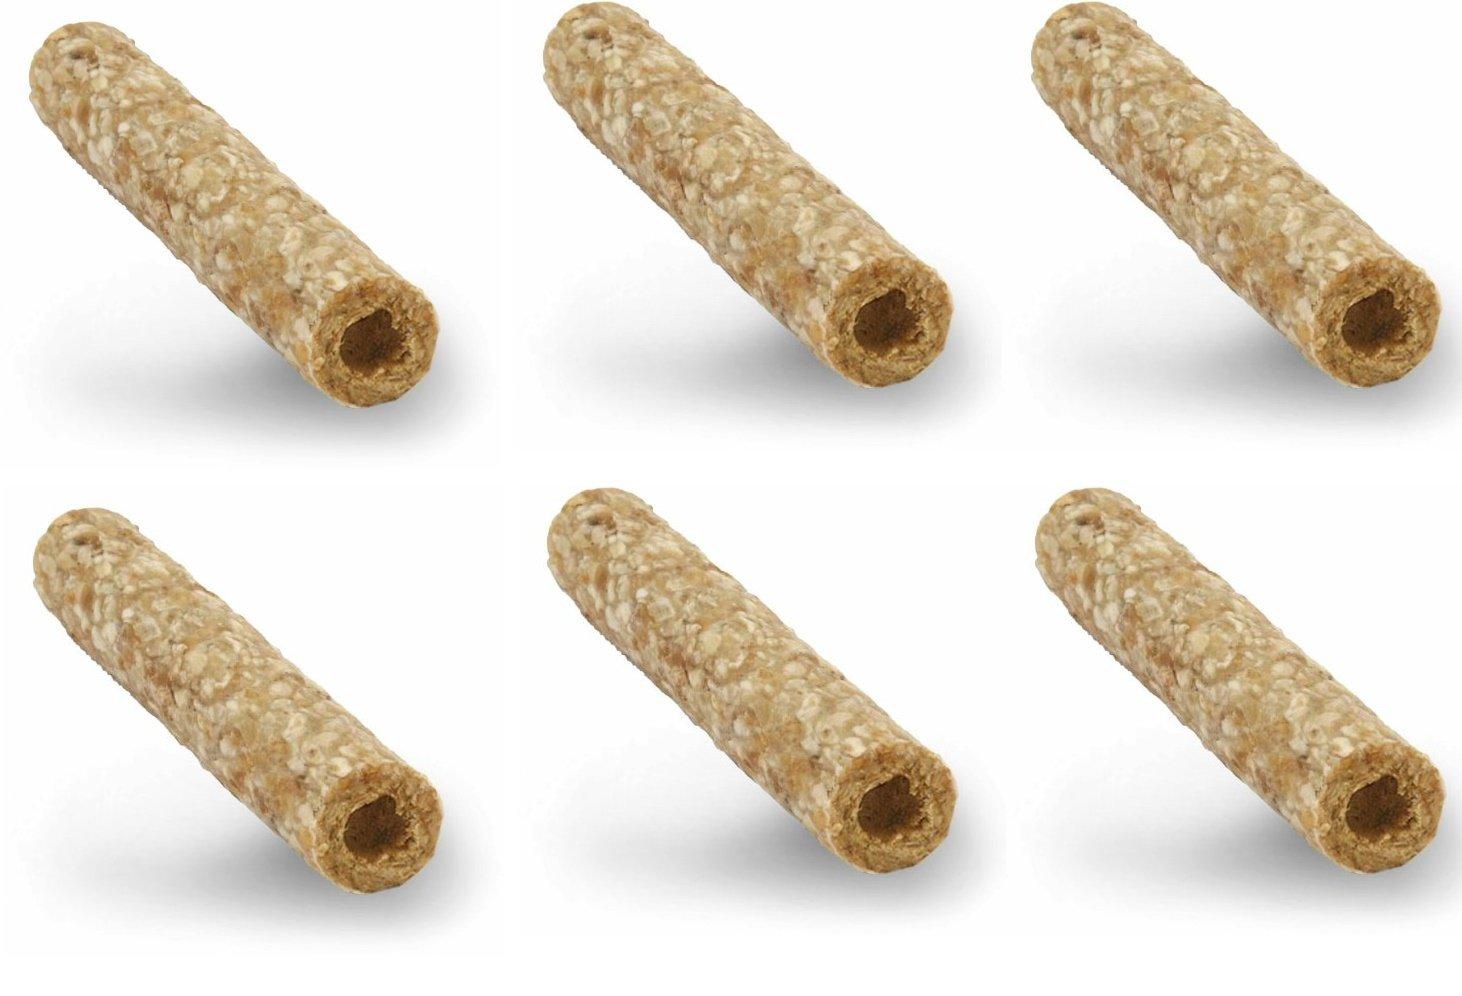 (6 Pack) Redbarn Filled Munchie Retriver, Peanut Butter